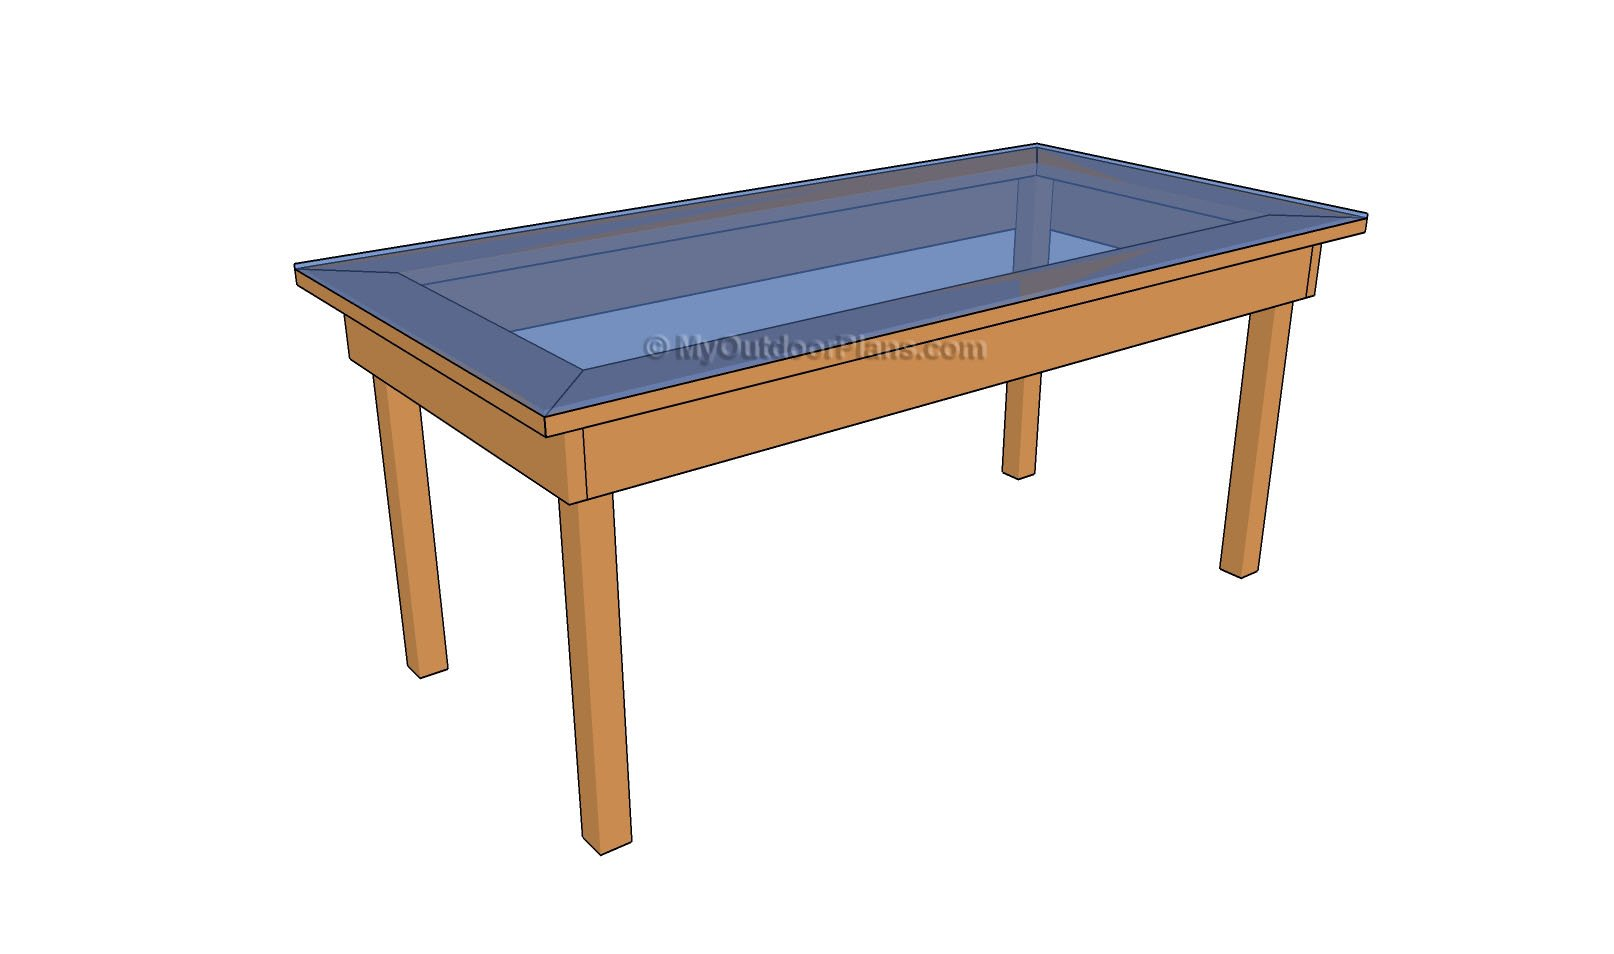 Kane: Useful Wood bistro table plans